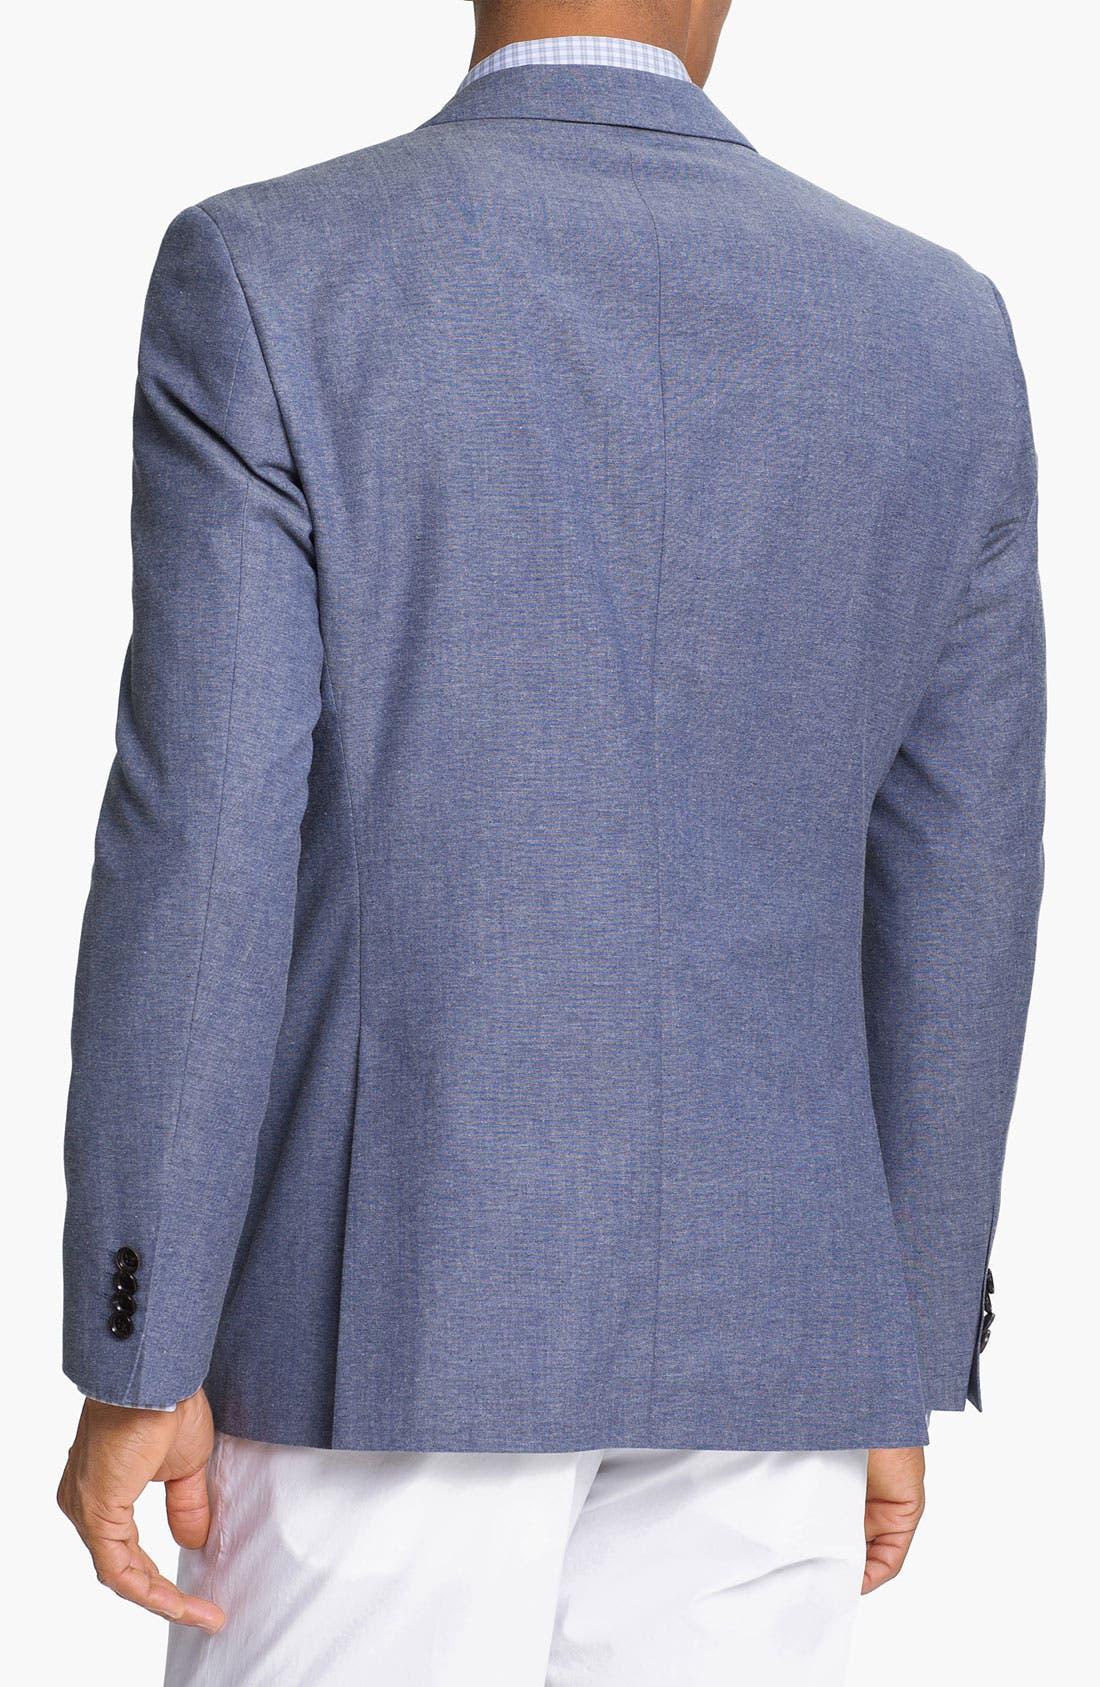 Alternate Image 2  - BOSS HUGO BOSS 'Jesse' Trim Fit Cotton Blend Blazer